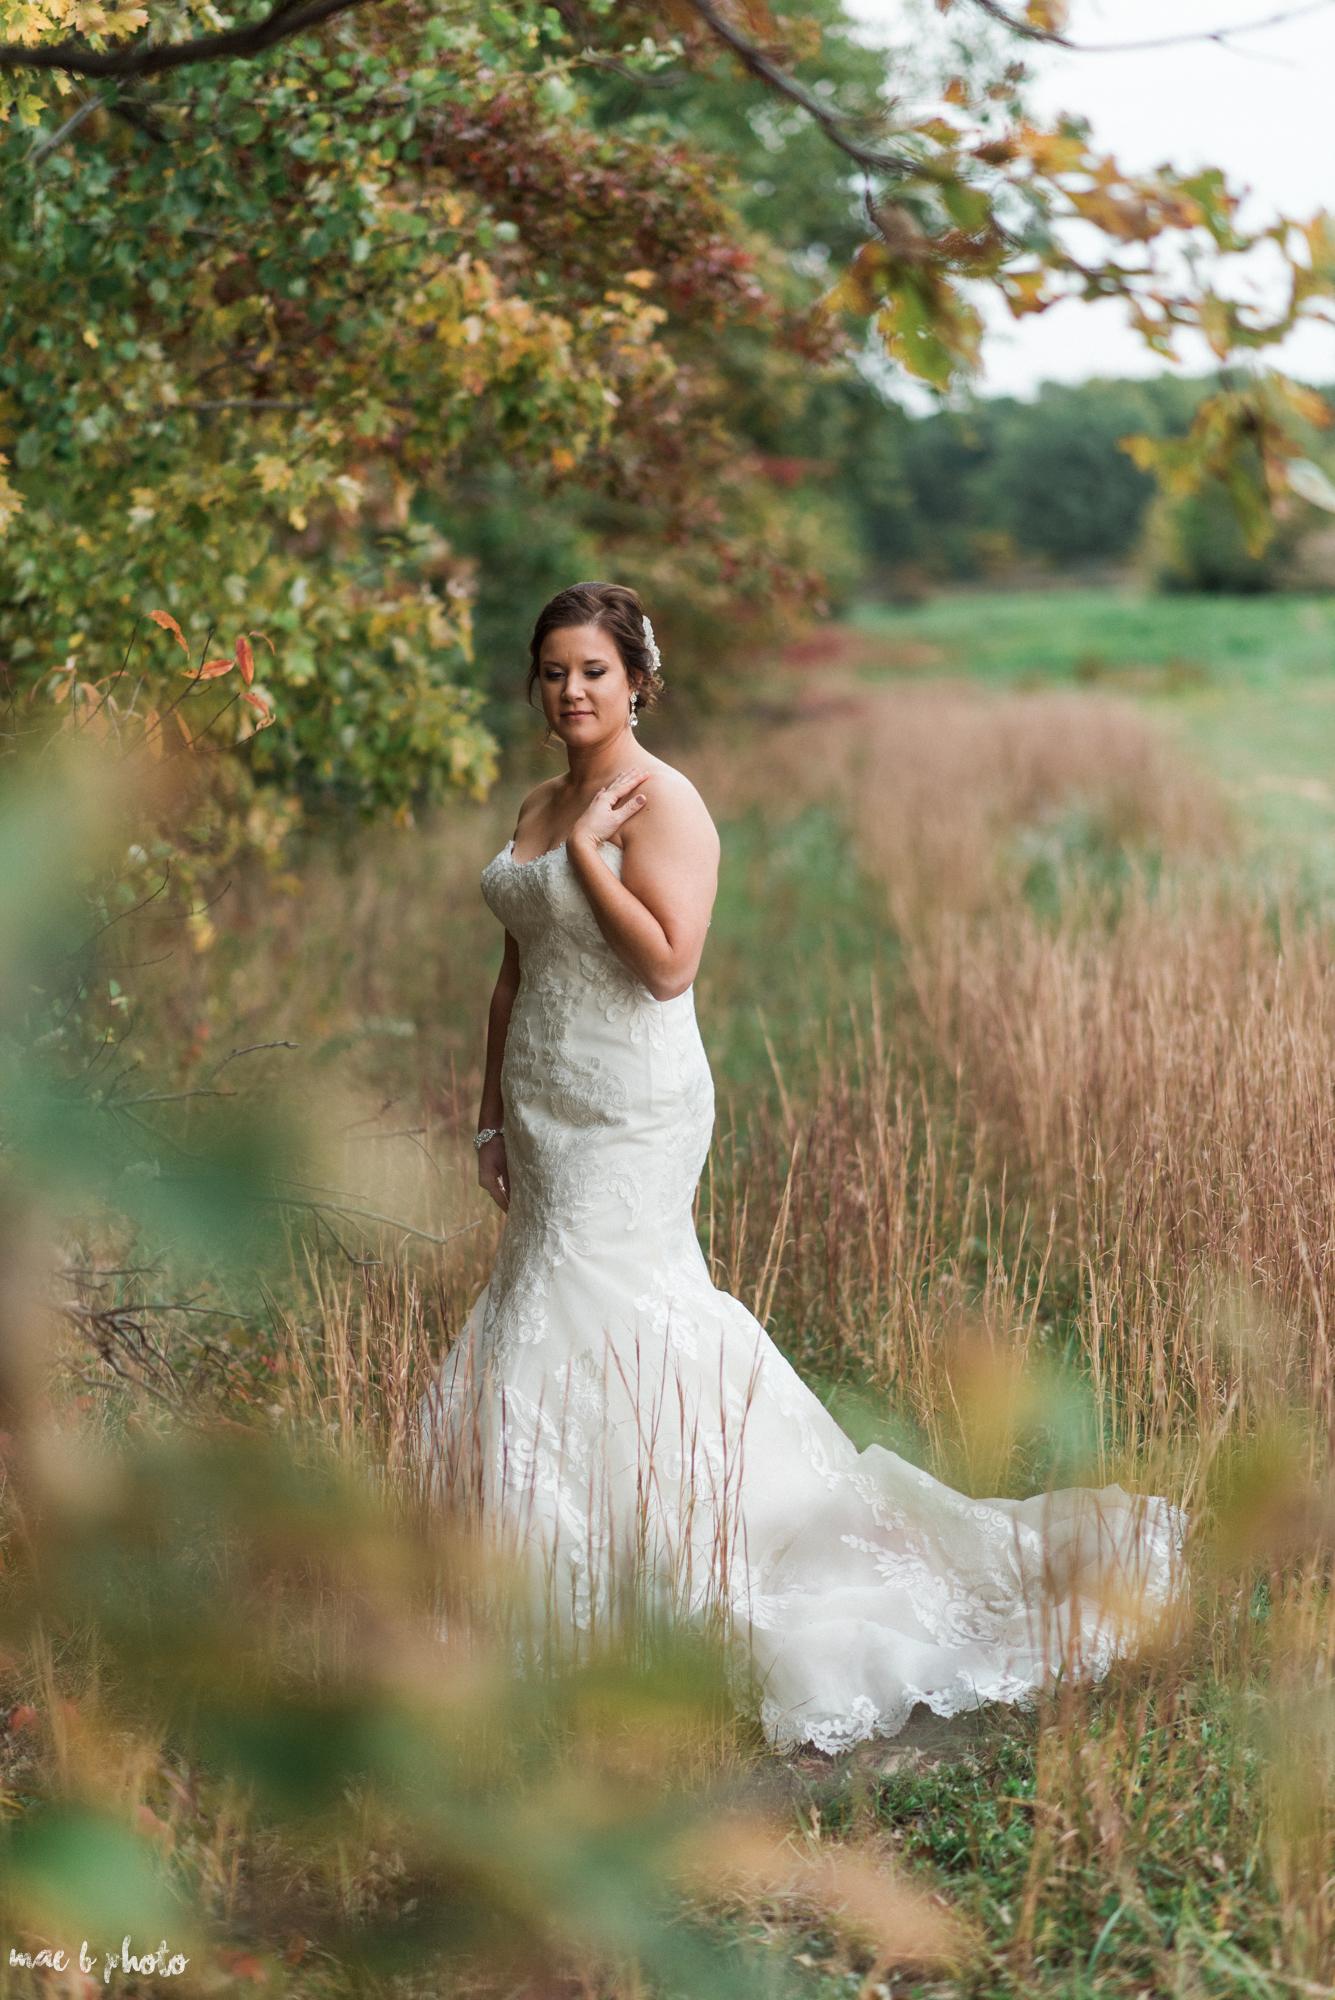 Sarah & Dustin's Rustic Chic Barn Wedding at Hartford Hill Winery in Hartford, Ohio by Mae B Photo-77.jpg